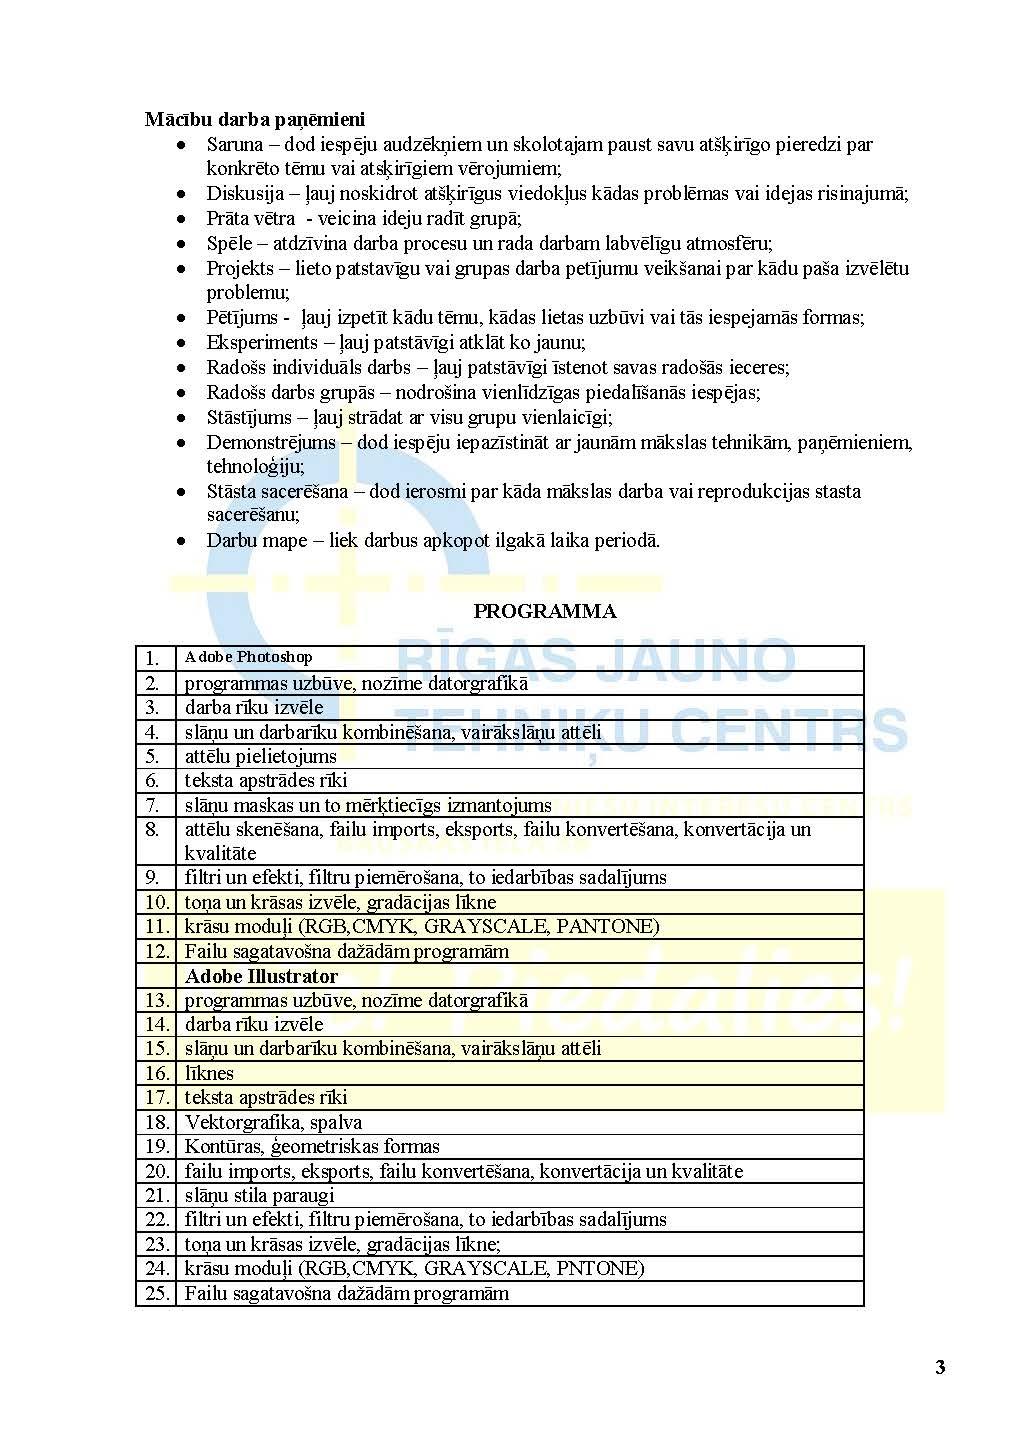 datorgrafikas-programma_page_3